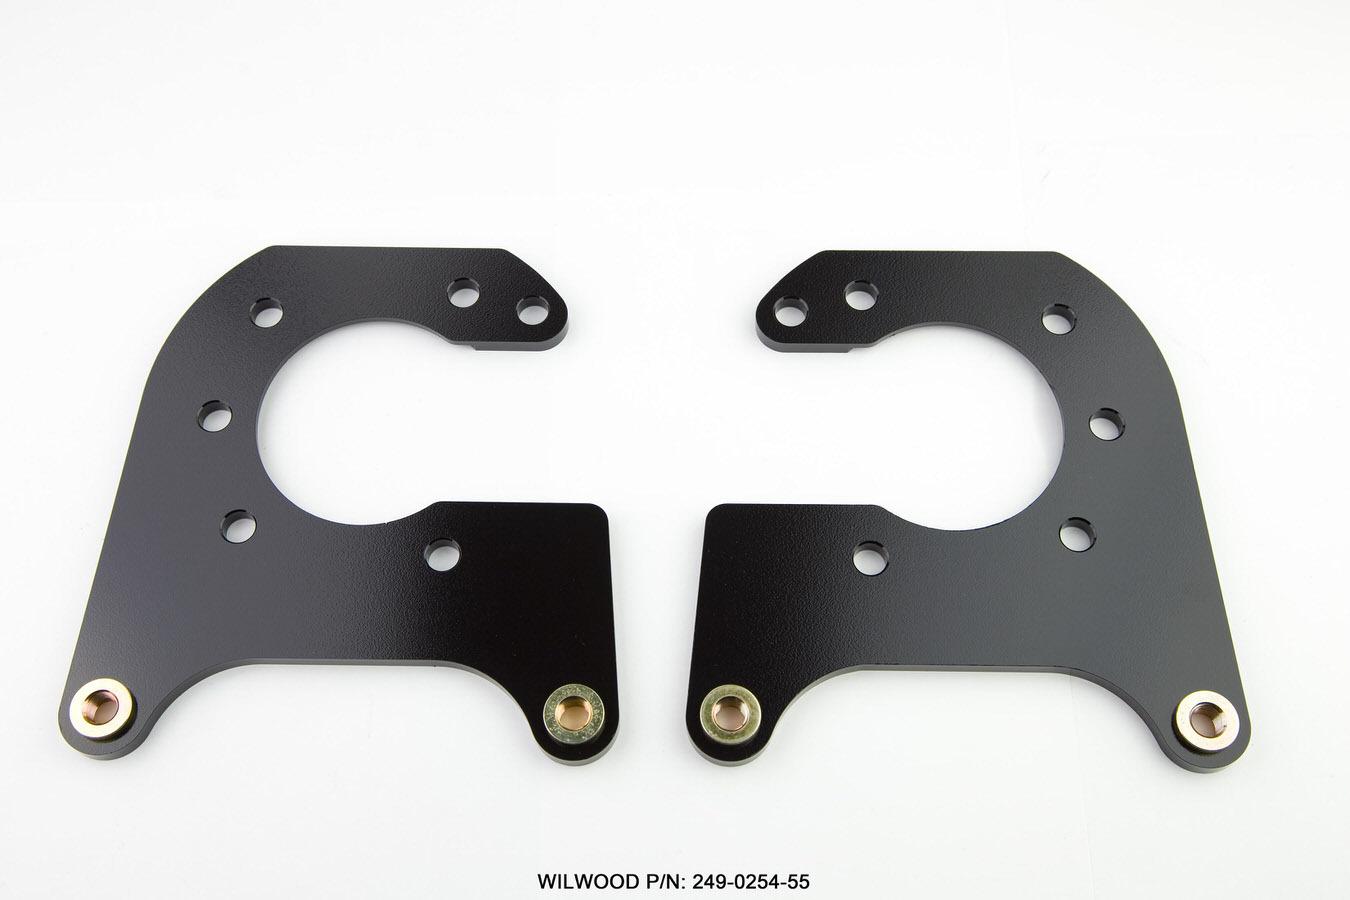 Wilwood 249-0254/55 Brake Caliper Bracket, Rear, Aluminum, Black Anodized, Dynalite Caliper, Oldsmobile / Pontiac, Pair